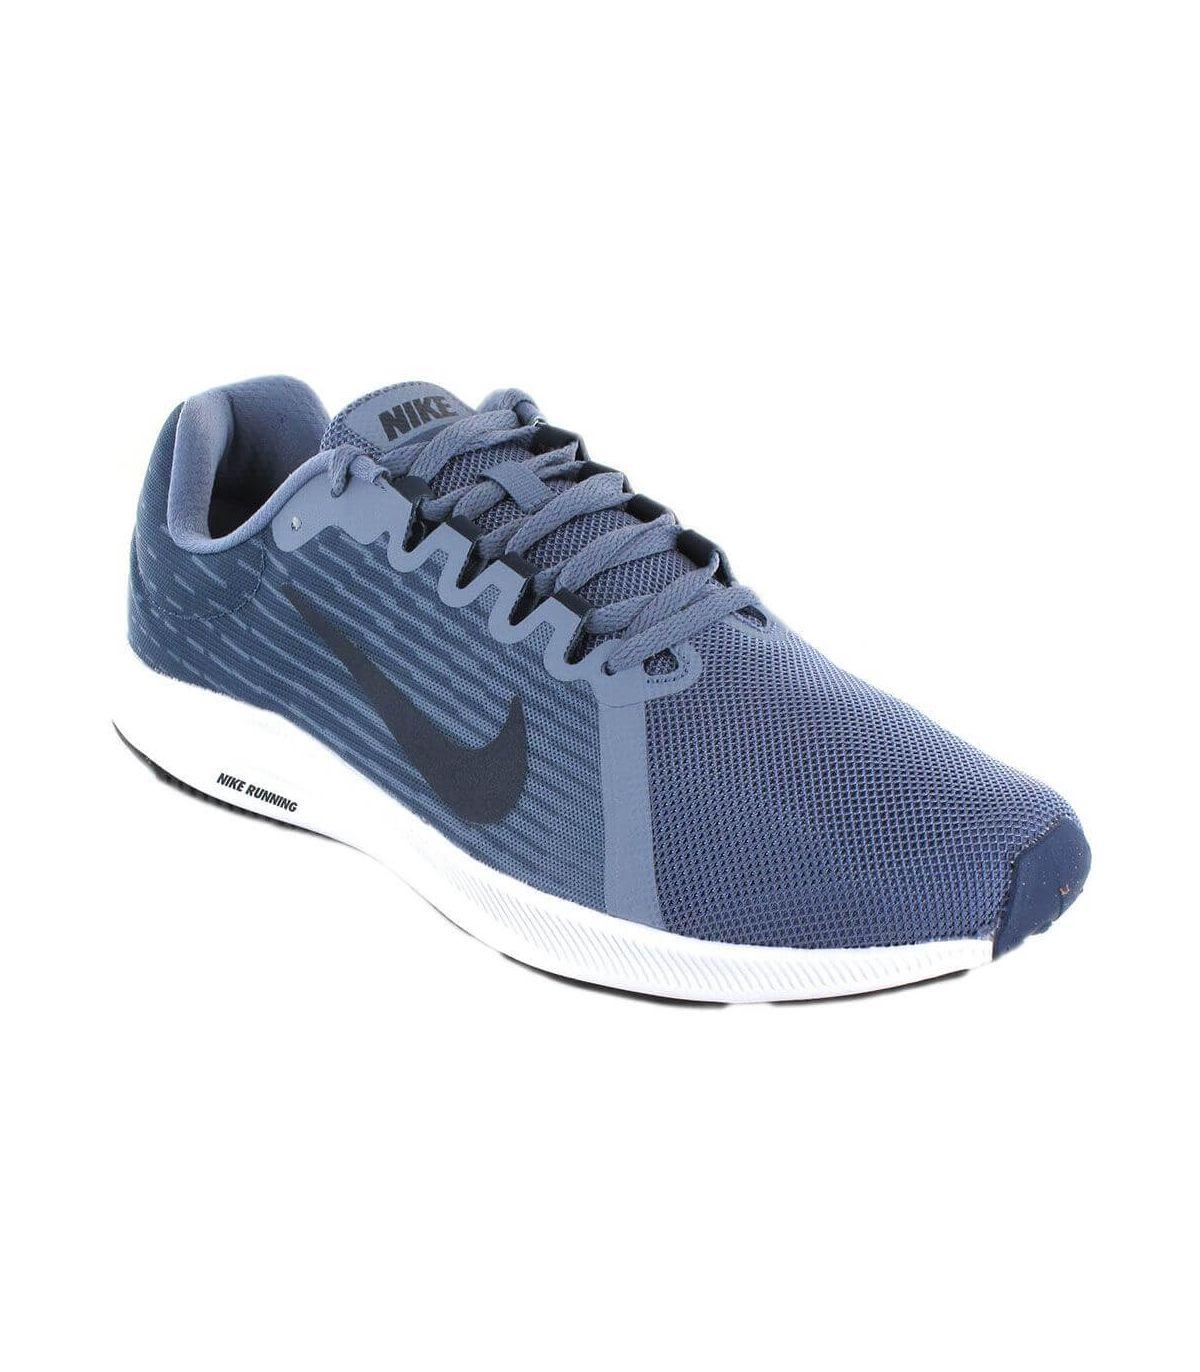 Nike Downshifter 8 402